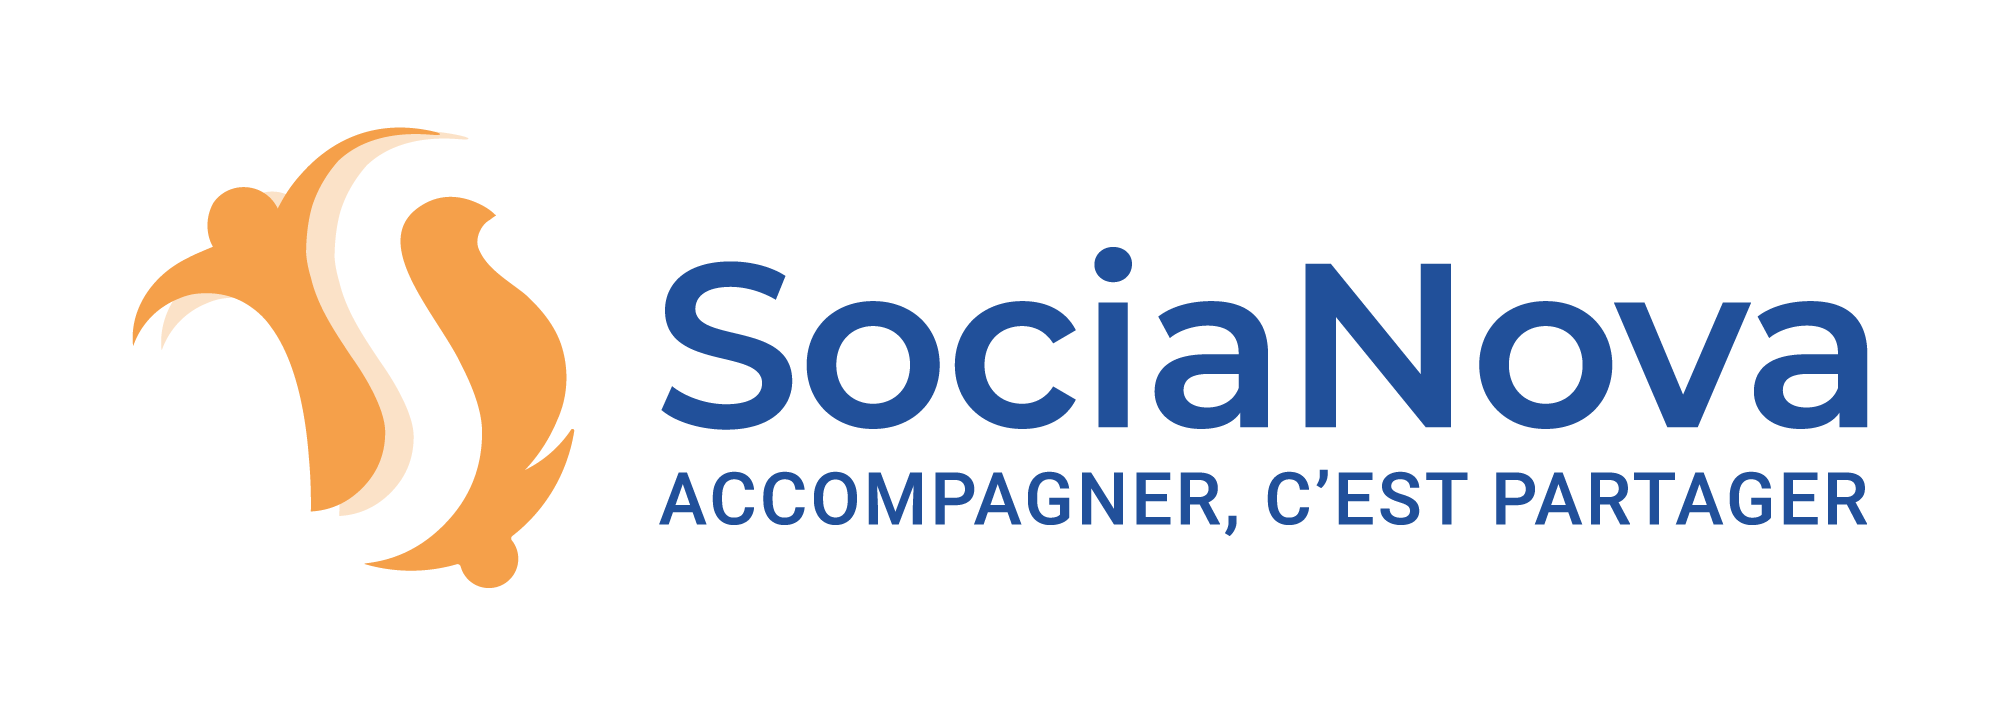 SociaNova